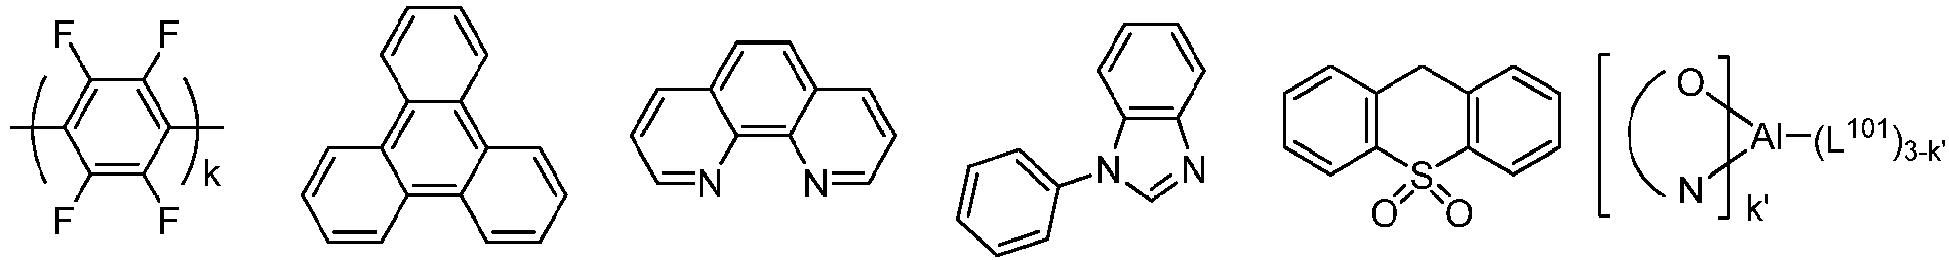 Figure imgb0938